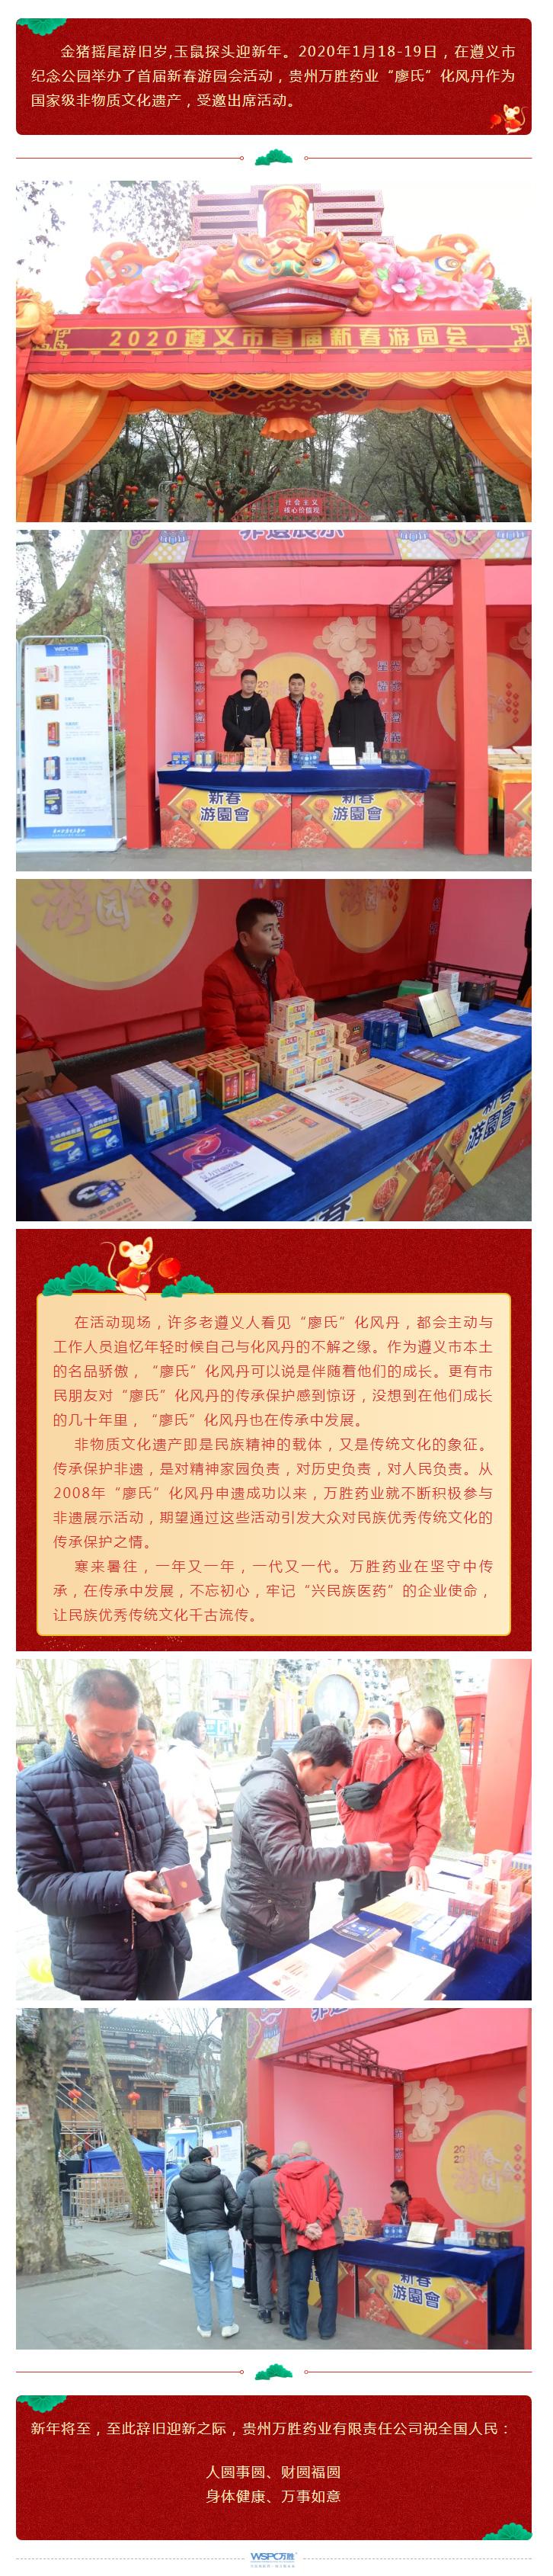 w88首页club w88受邀参加2020遵义市首届新春游园会.jpg